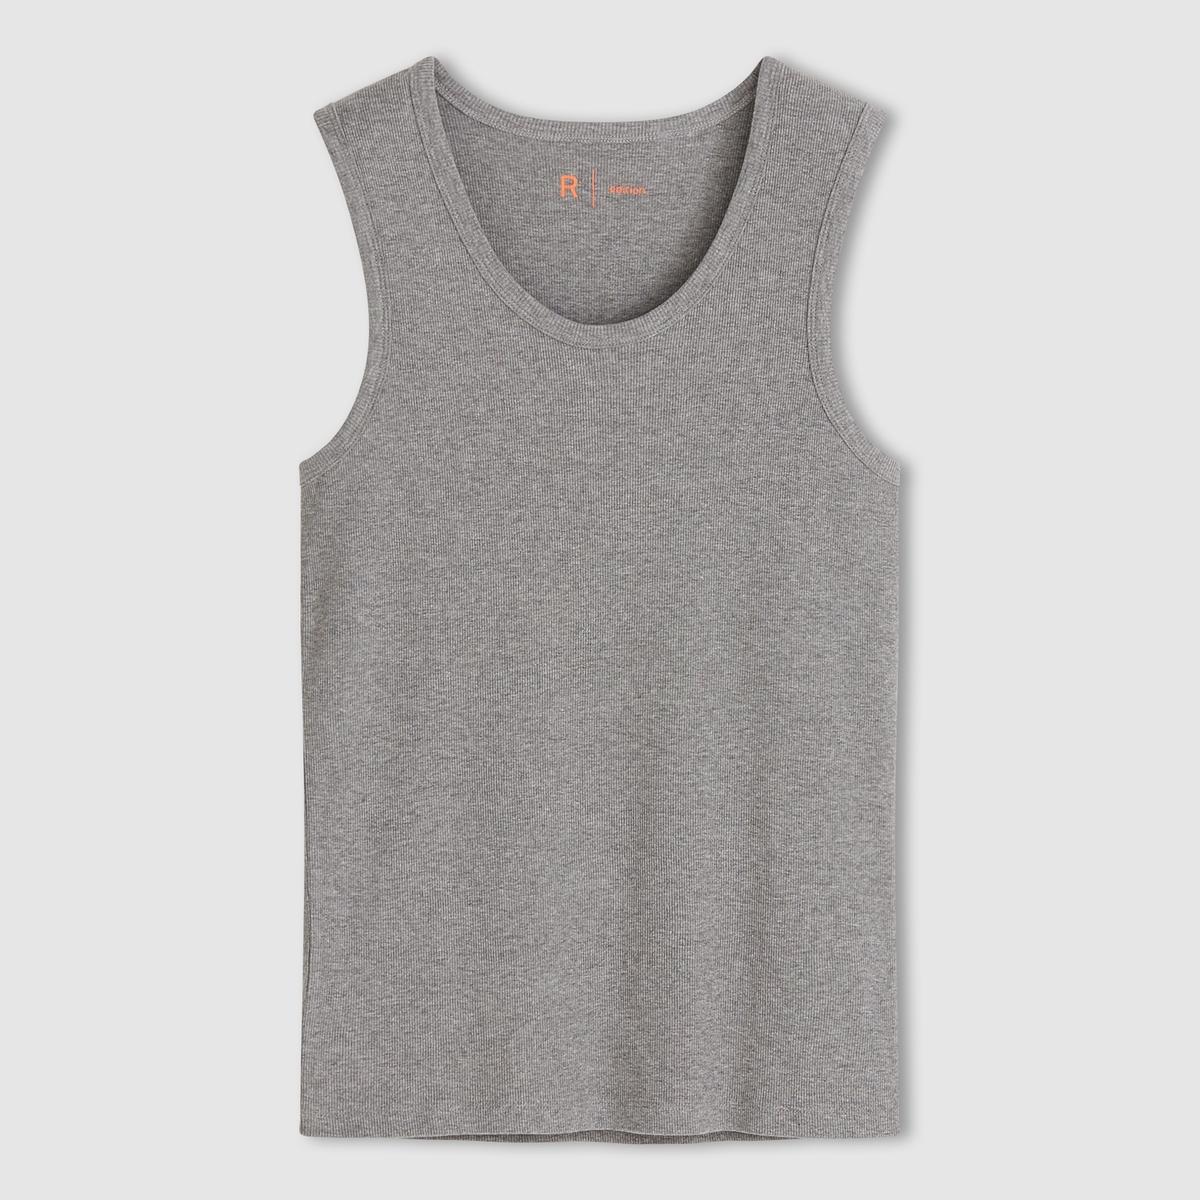 Camiseta sin mangas THEO canalé